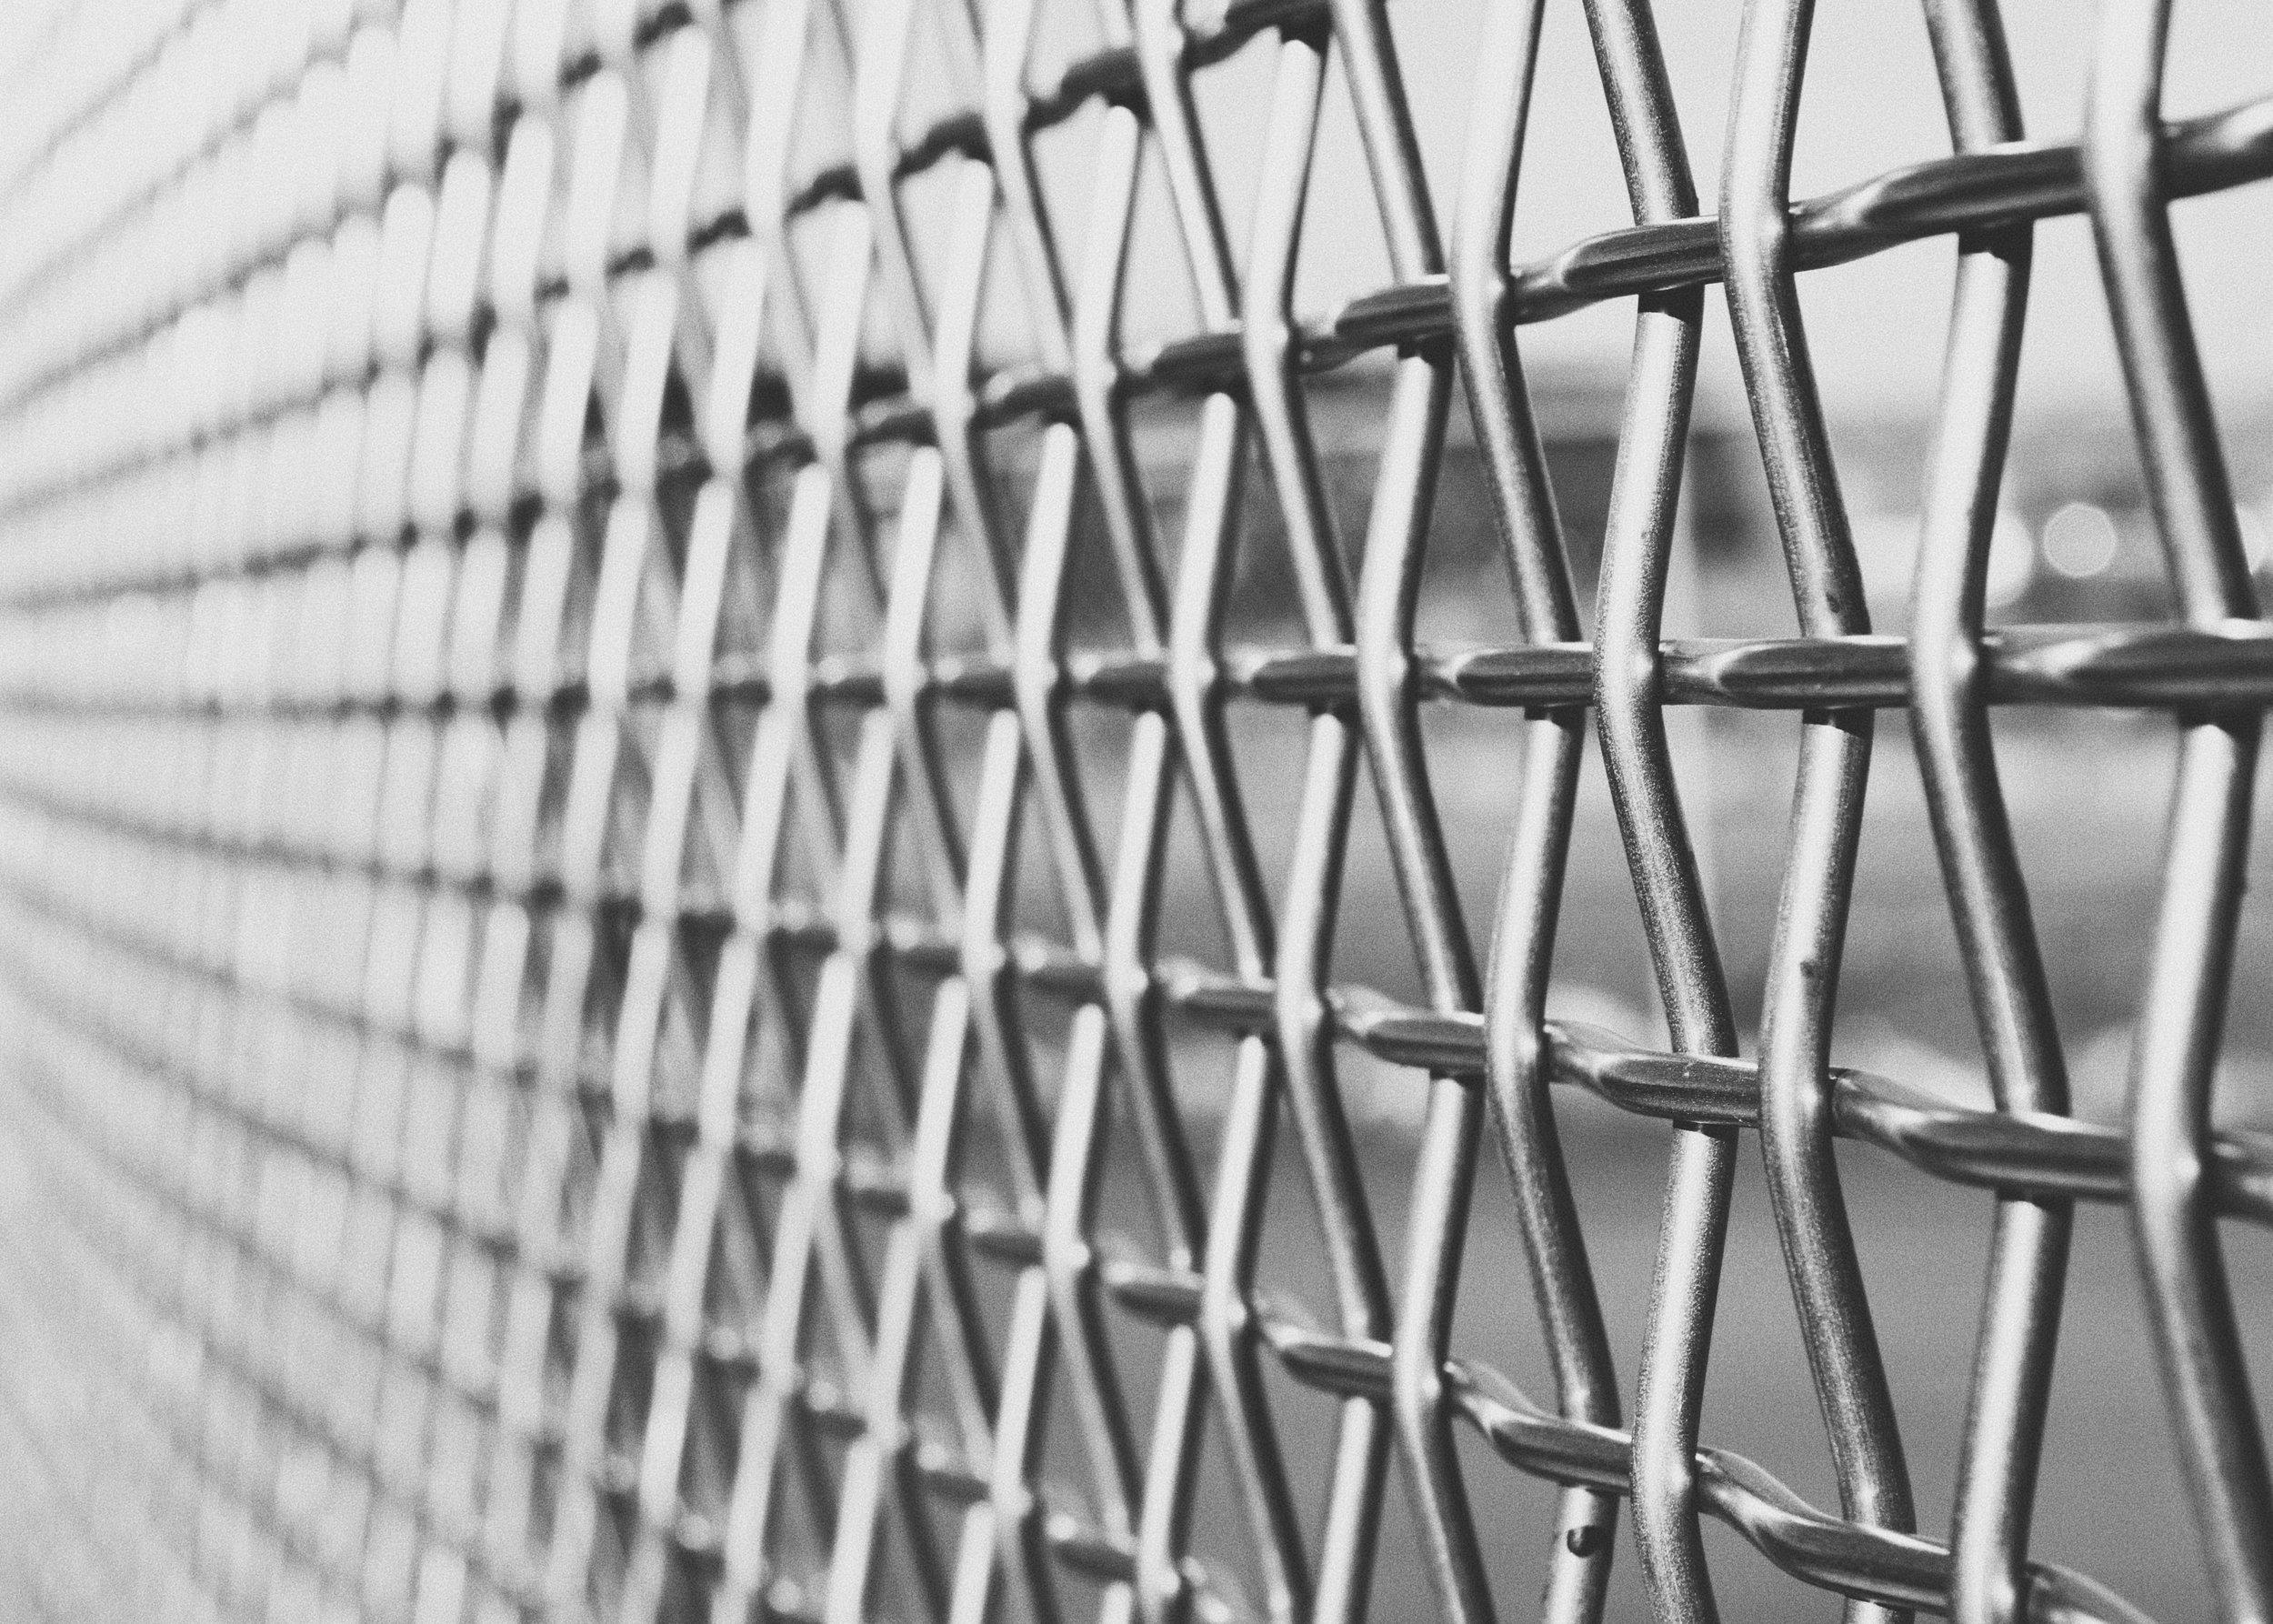 Copie de woven mesh